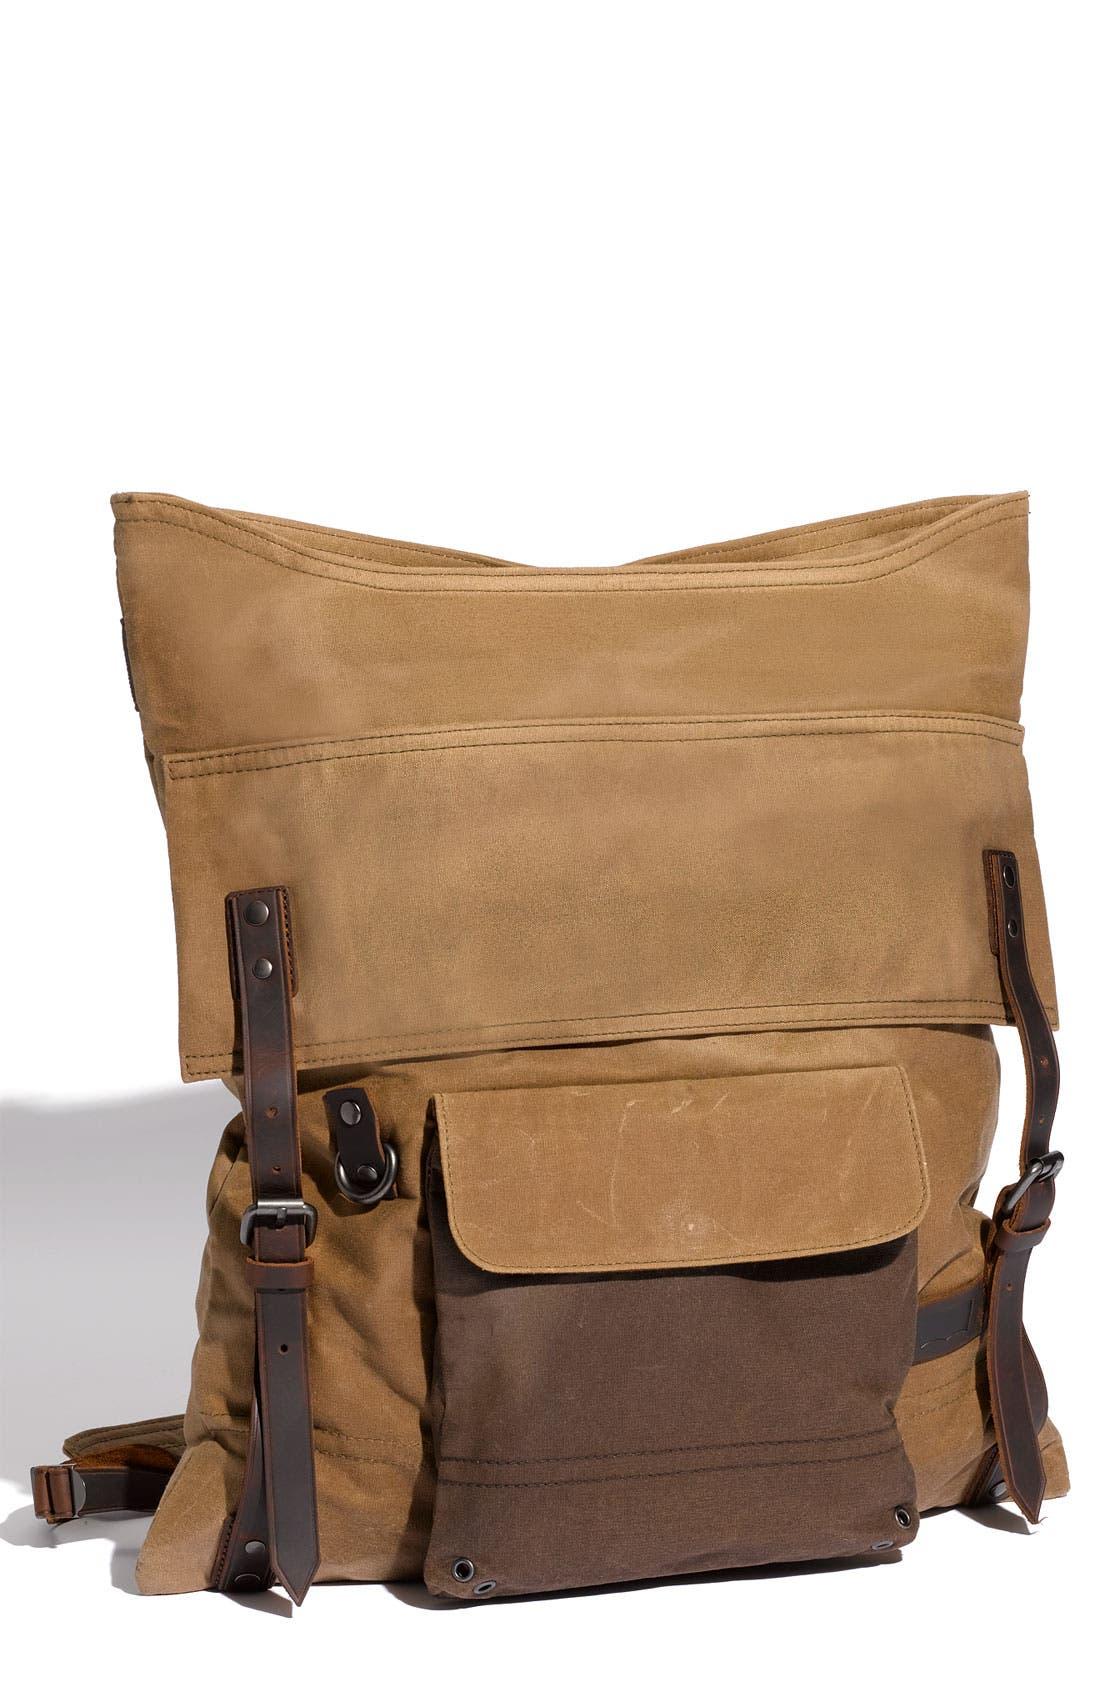 Alternate Image 1 Selected - Levi's 'River Rock' Backpack